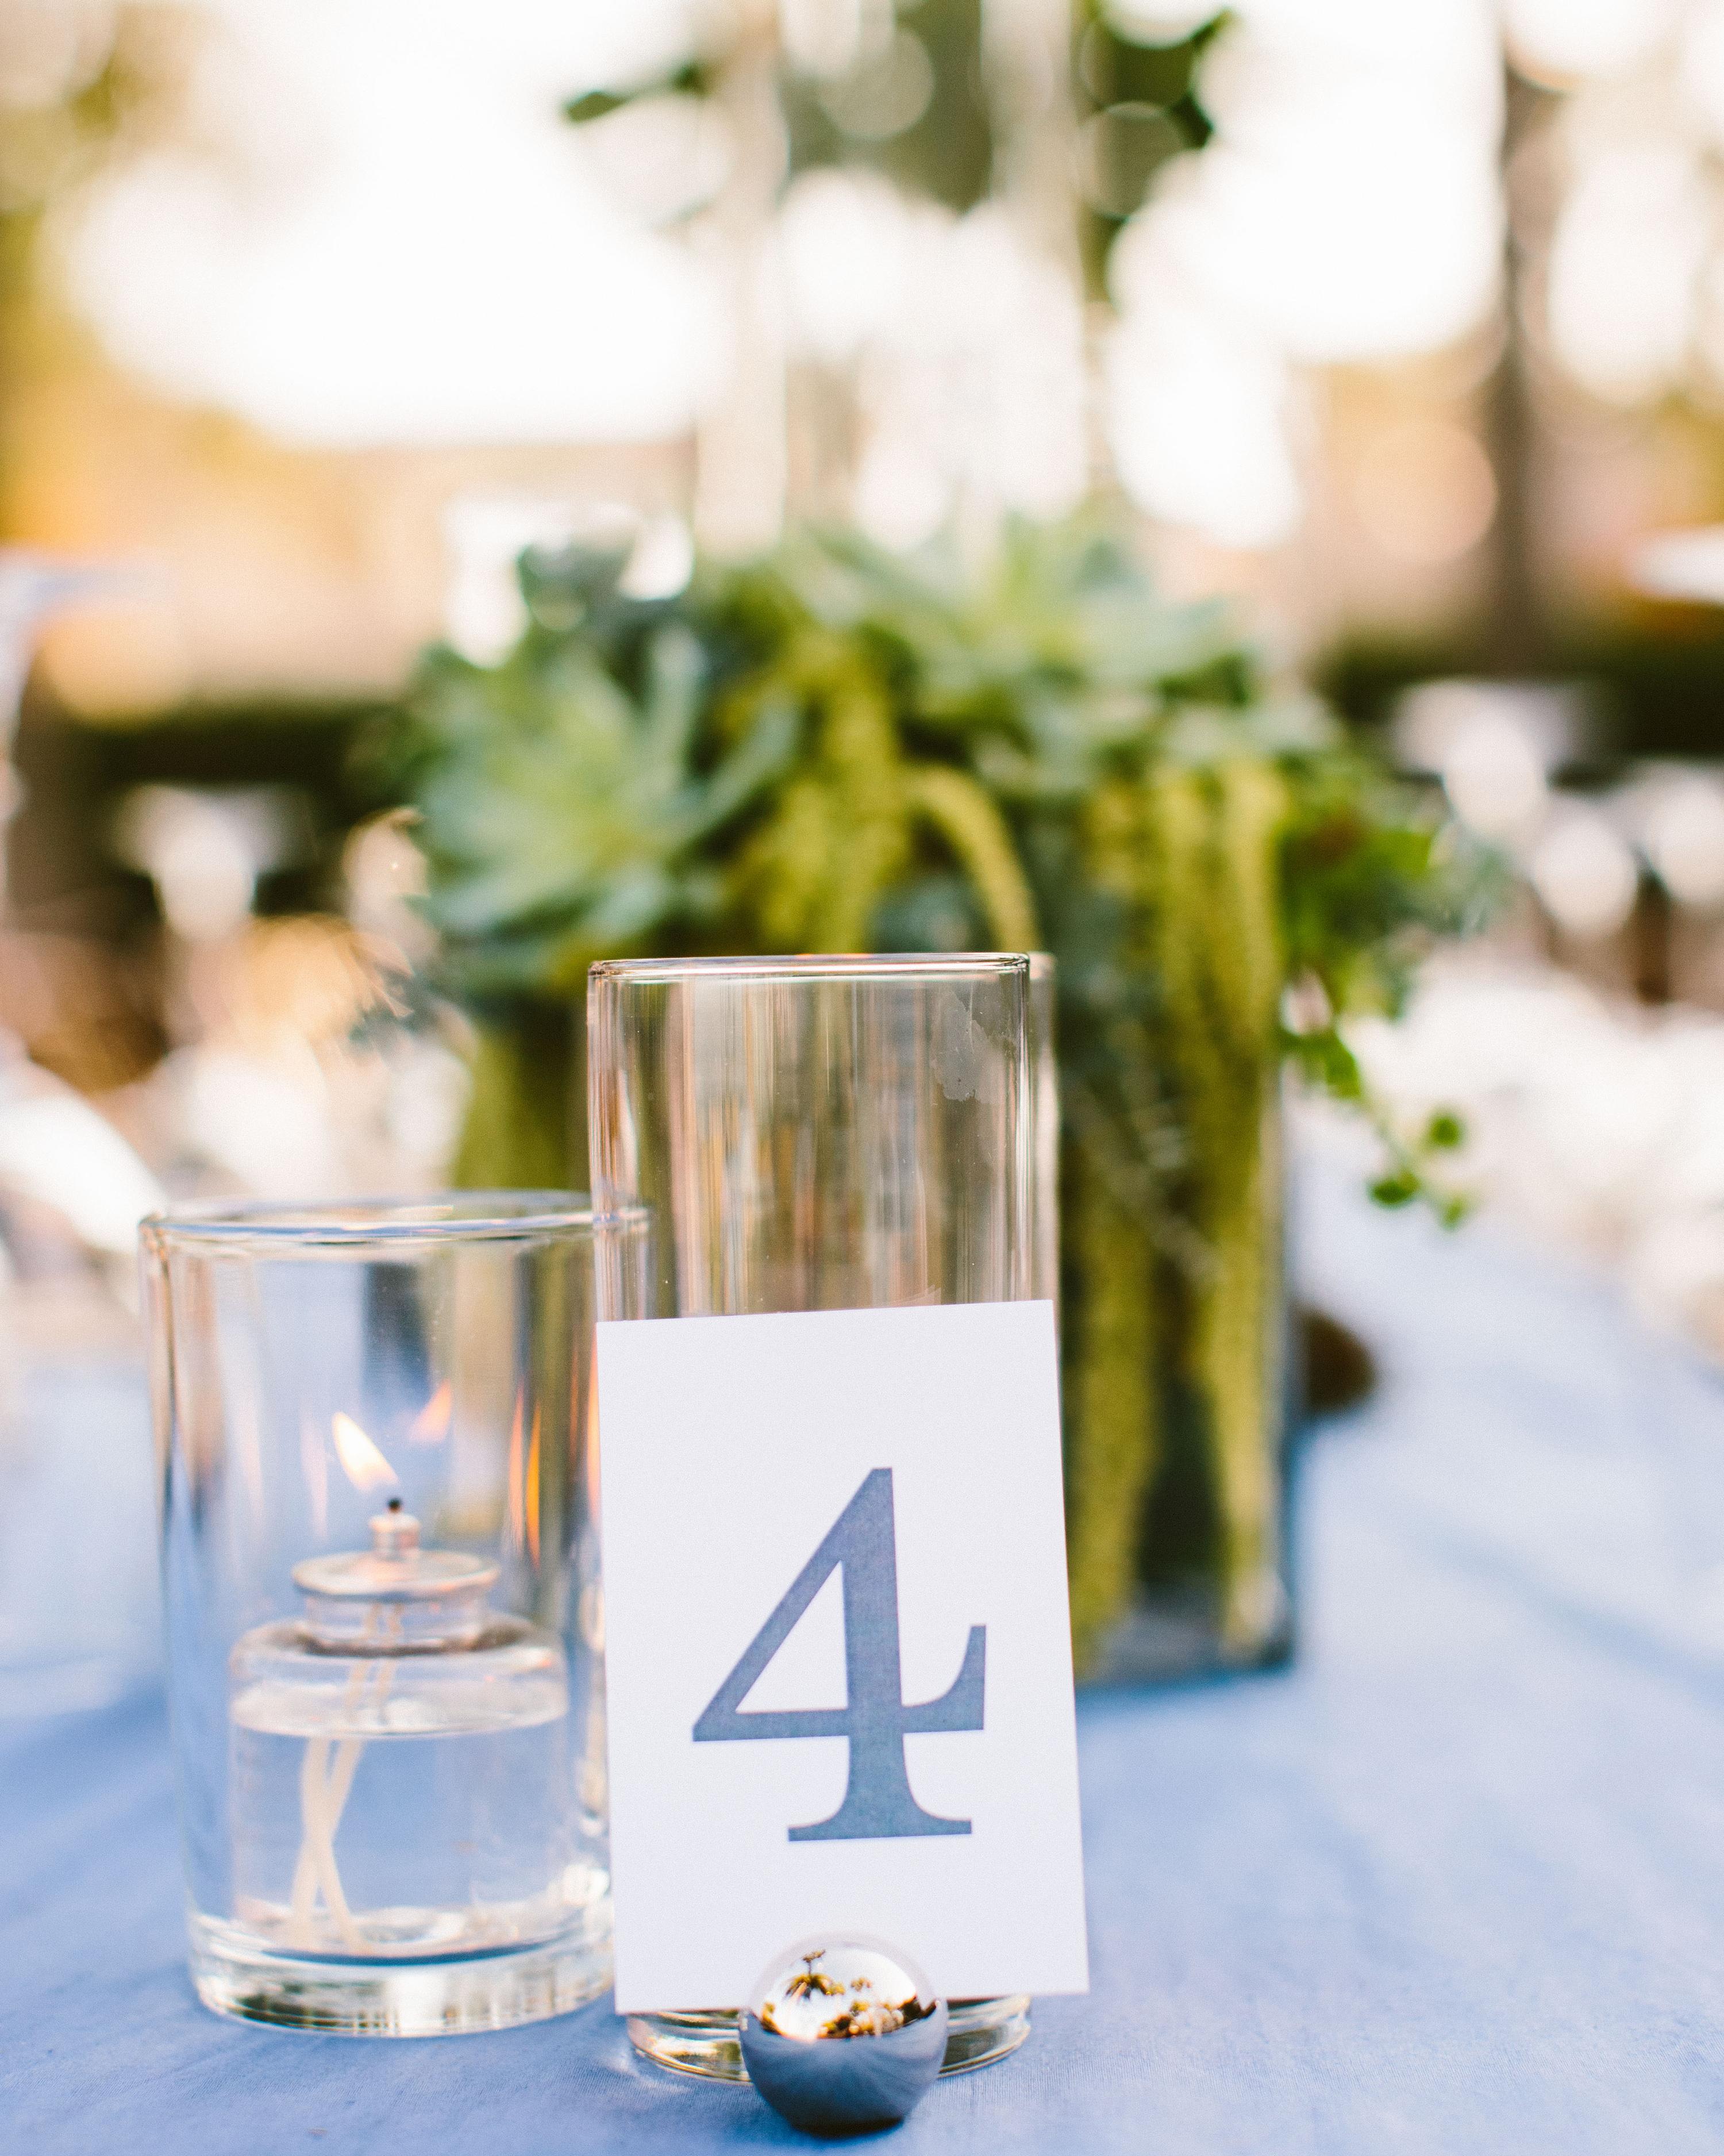 ali-jess-wedding-tablenumber-038-002-s111717-1214.jpg